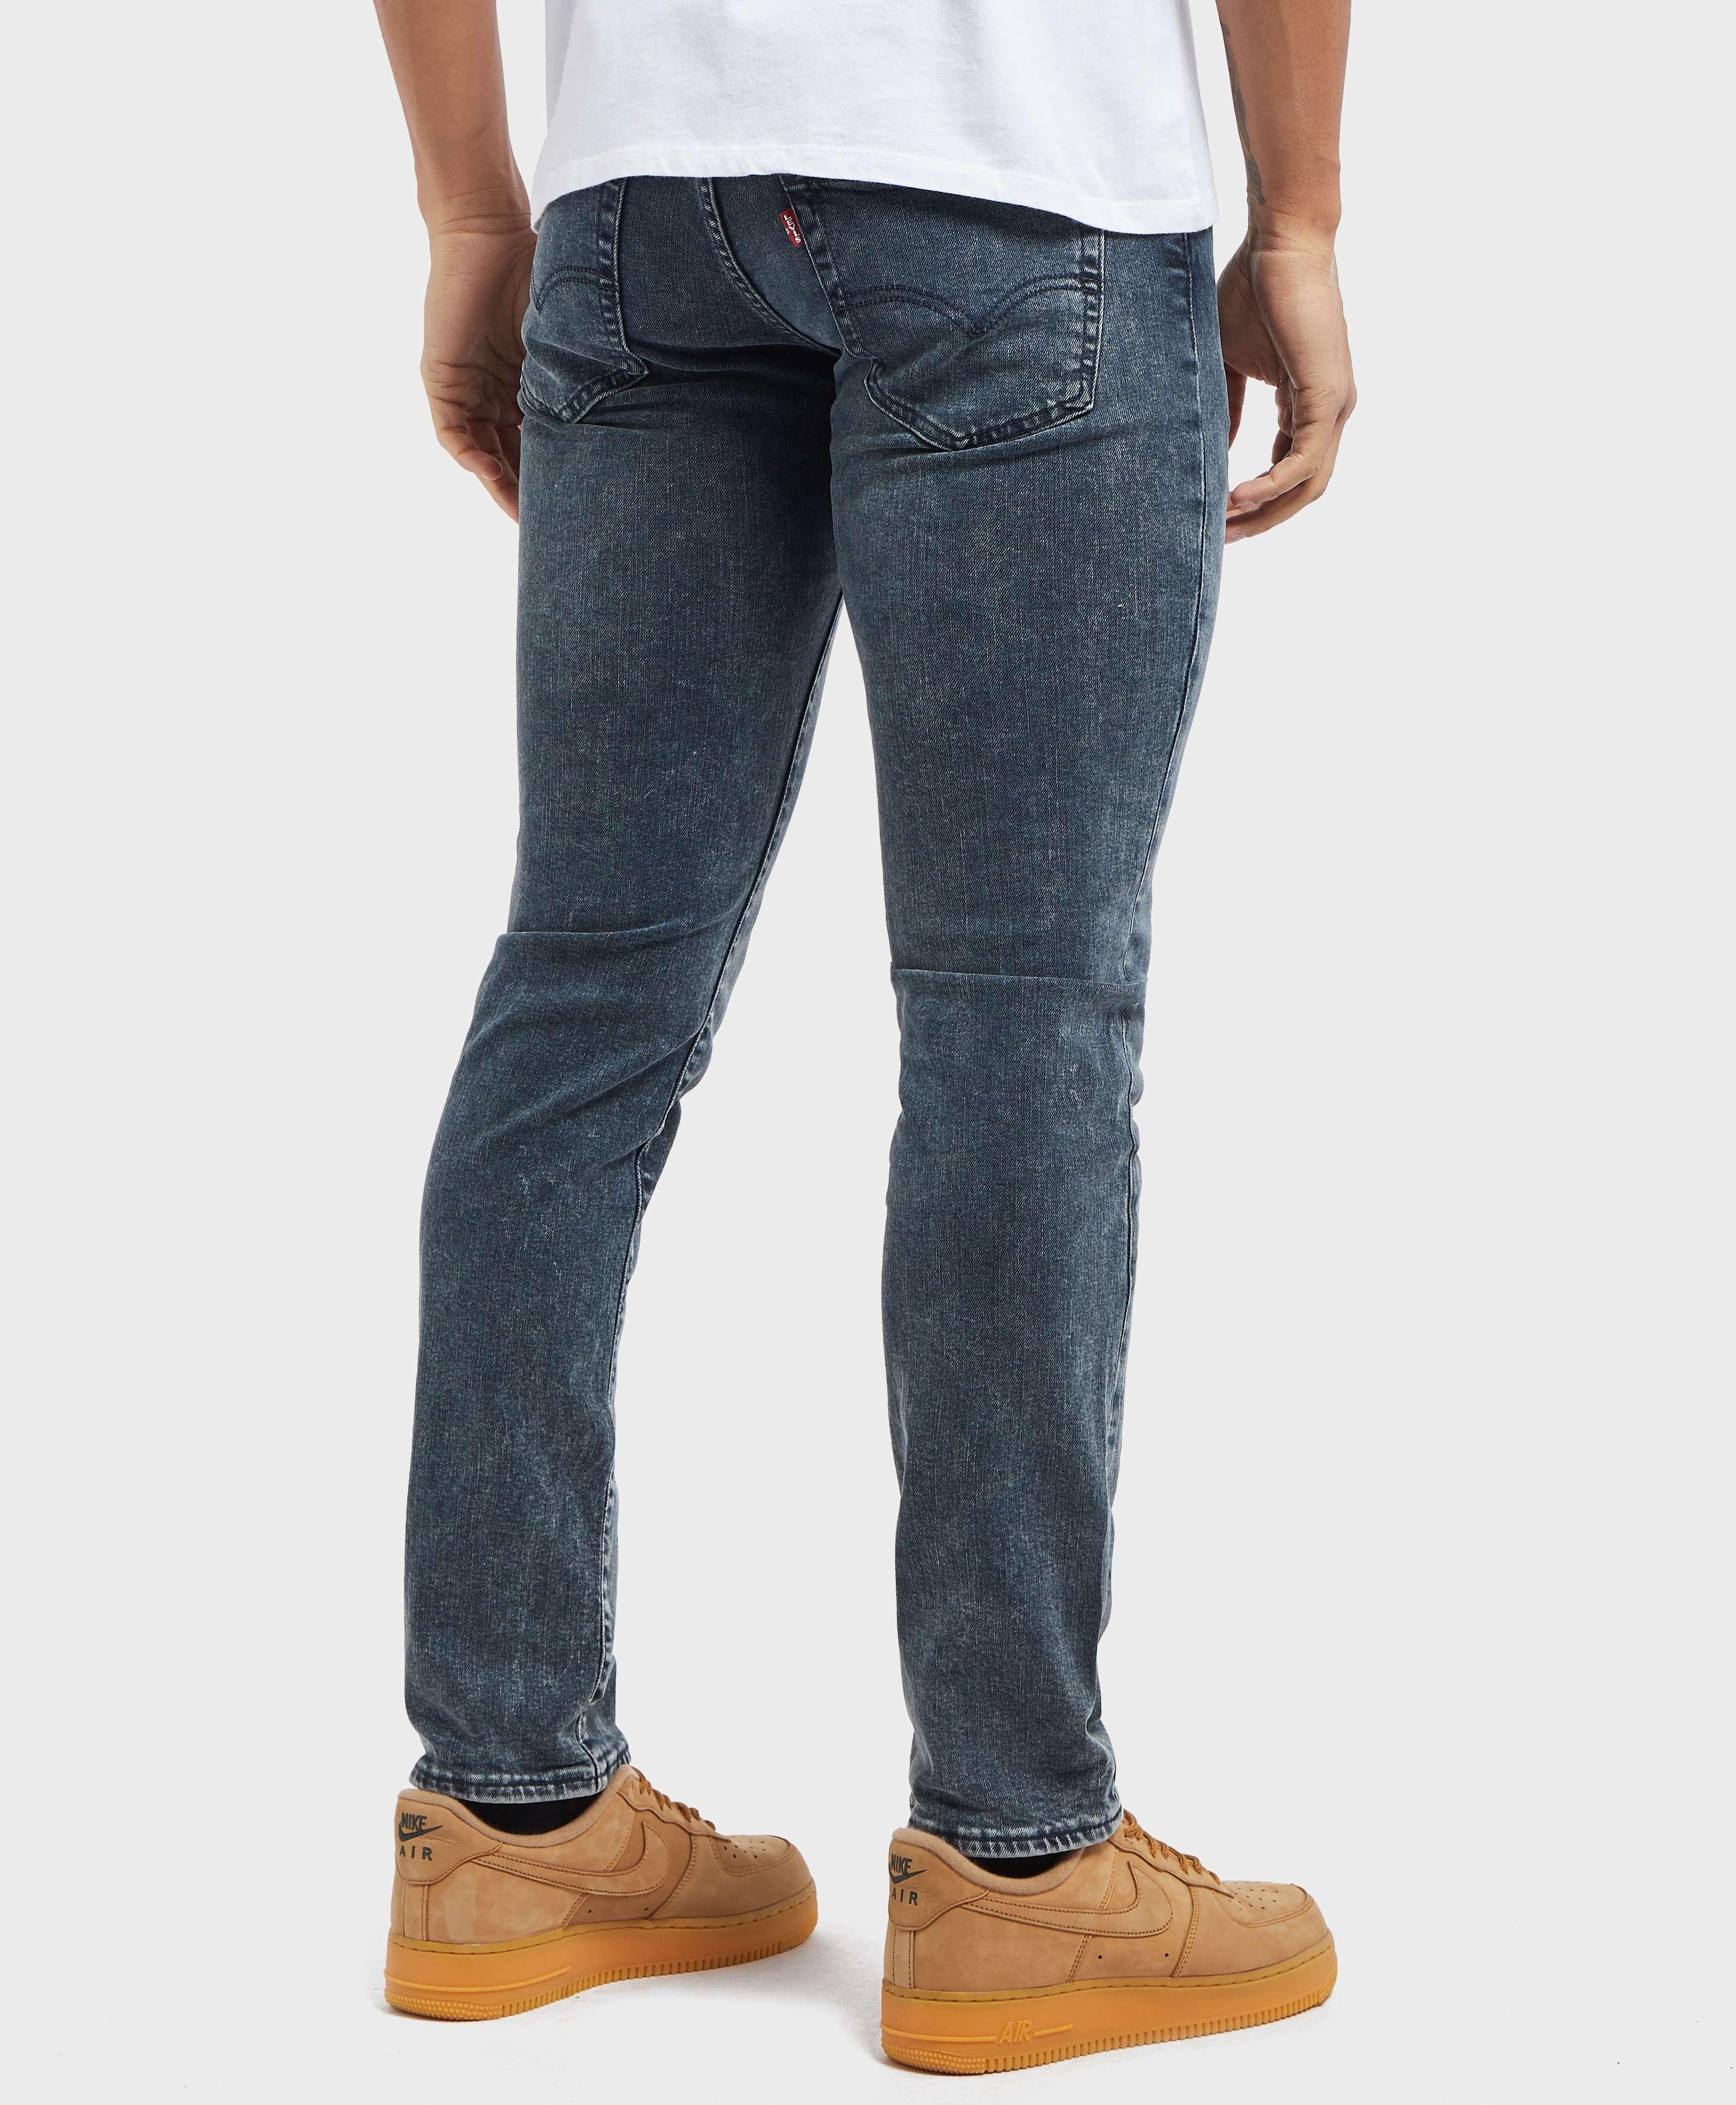 Levis 511 Slim Advanced Stretch Jeans